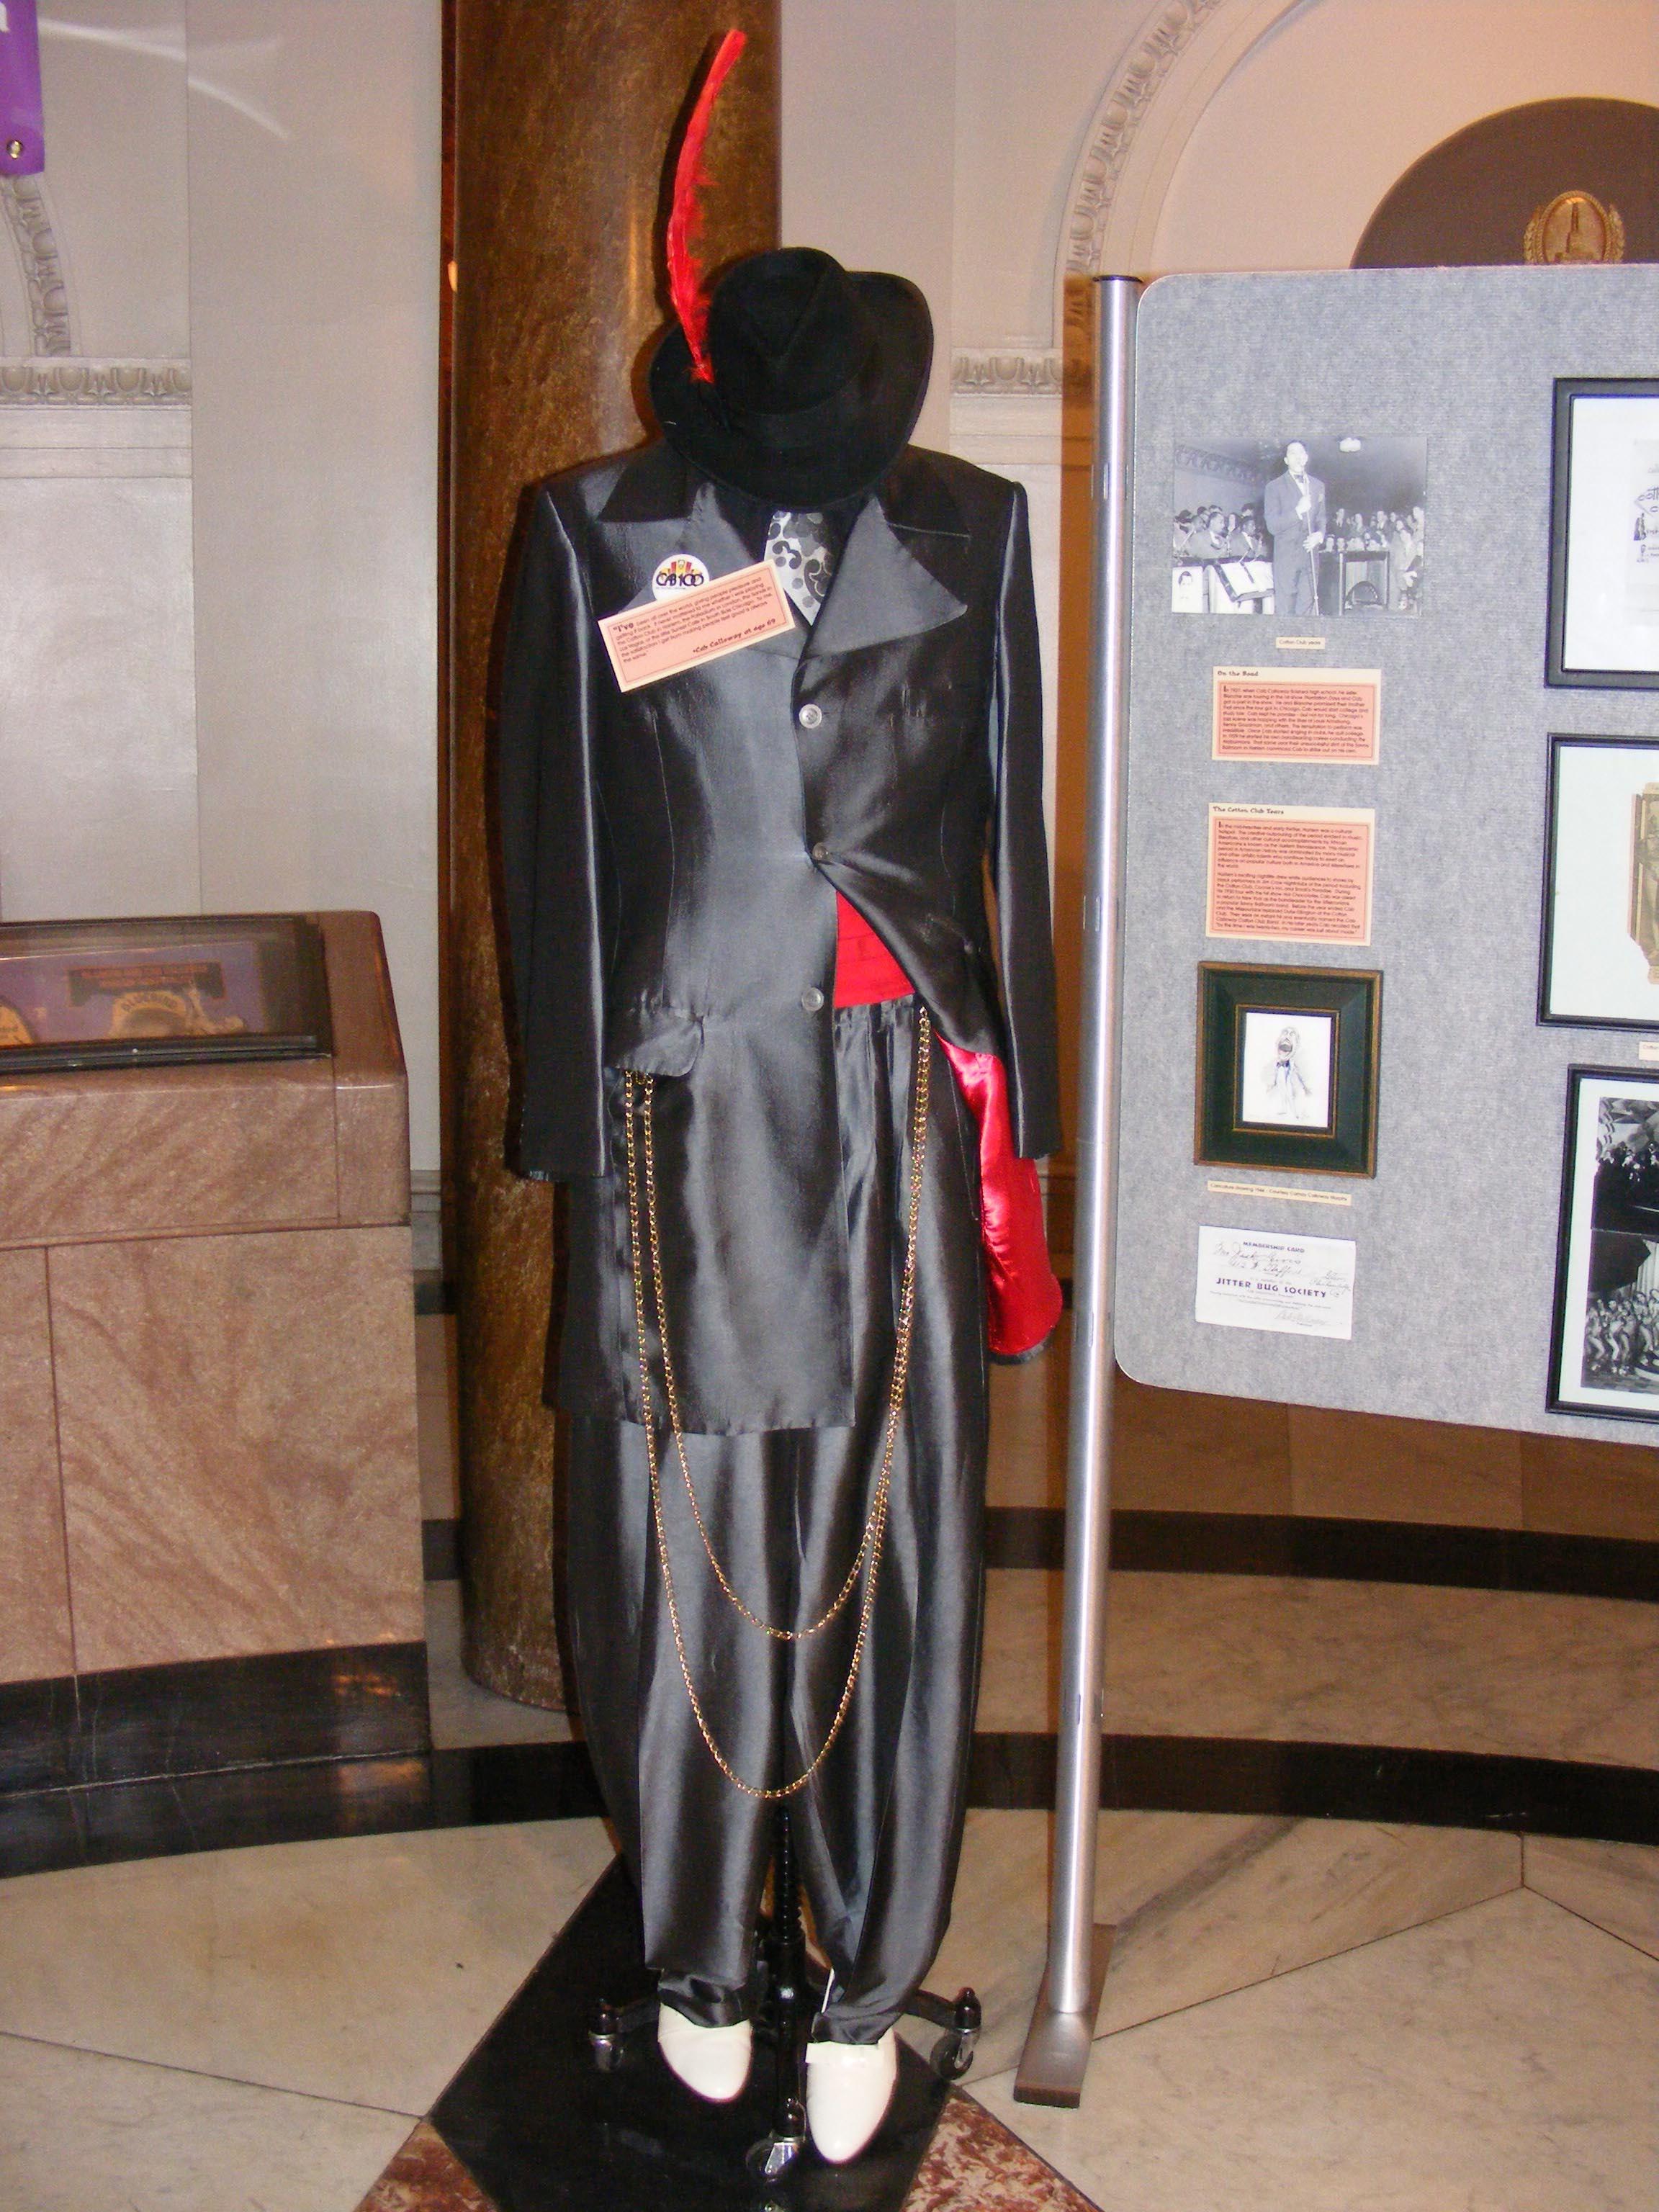 Cab Calloway's Zoot Suit